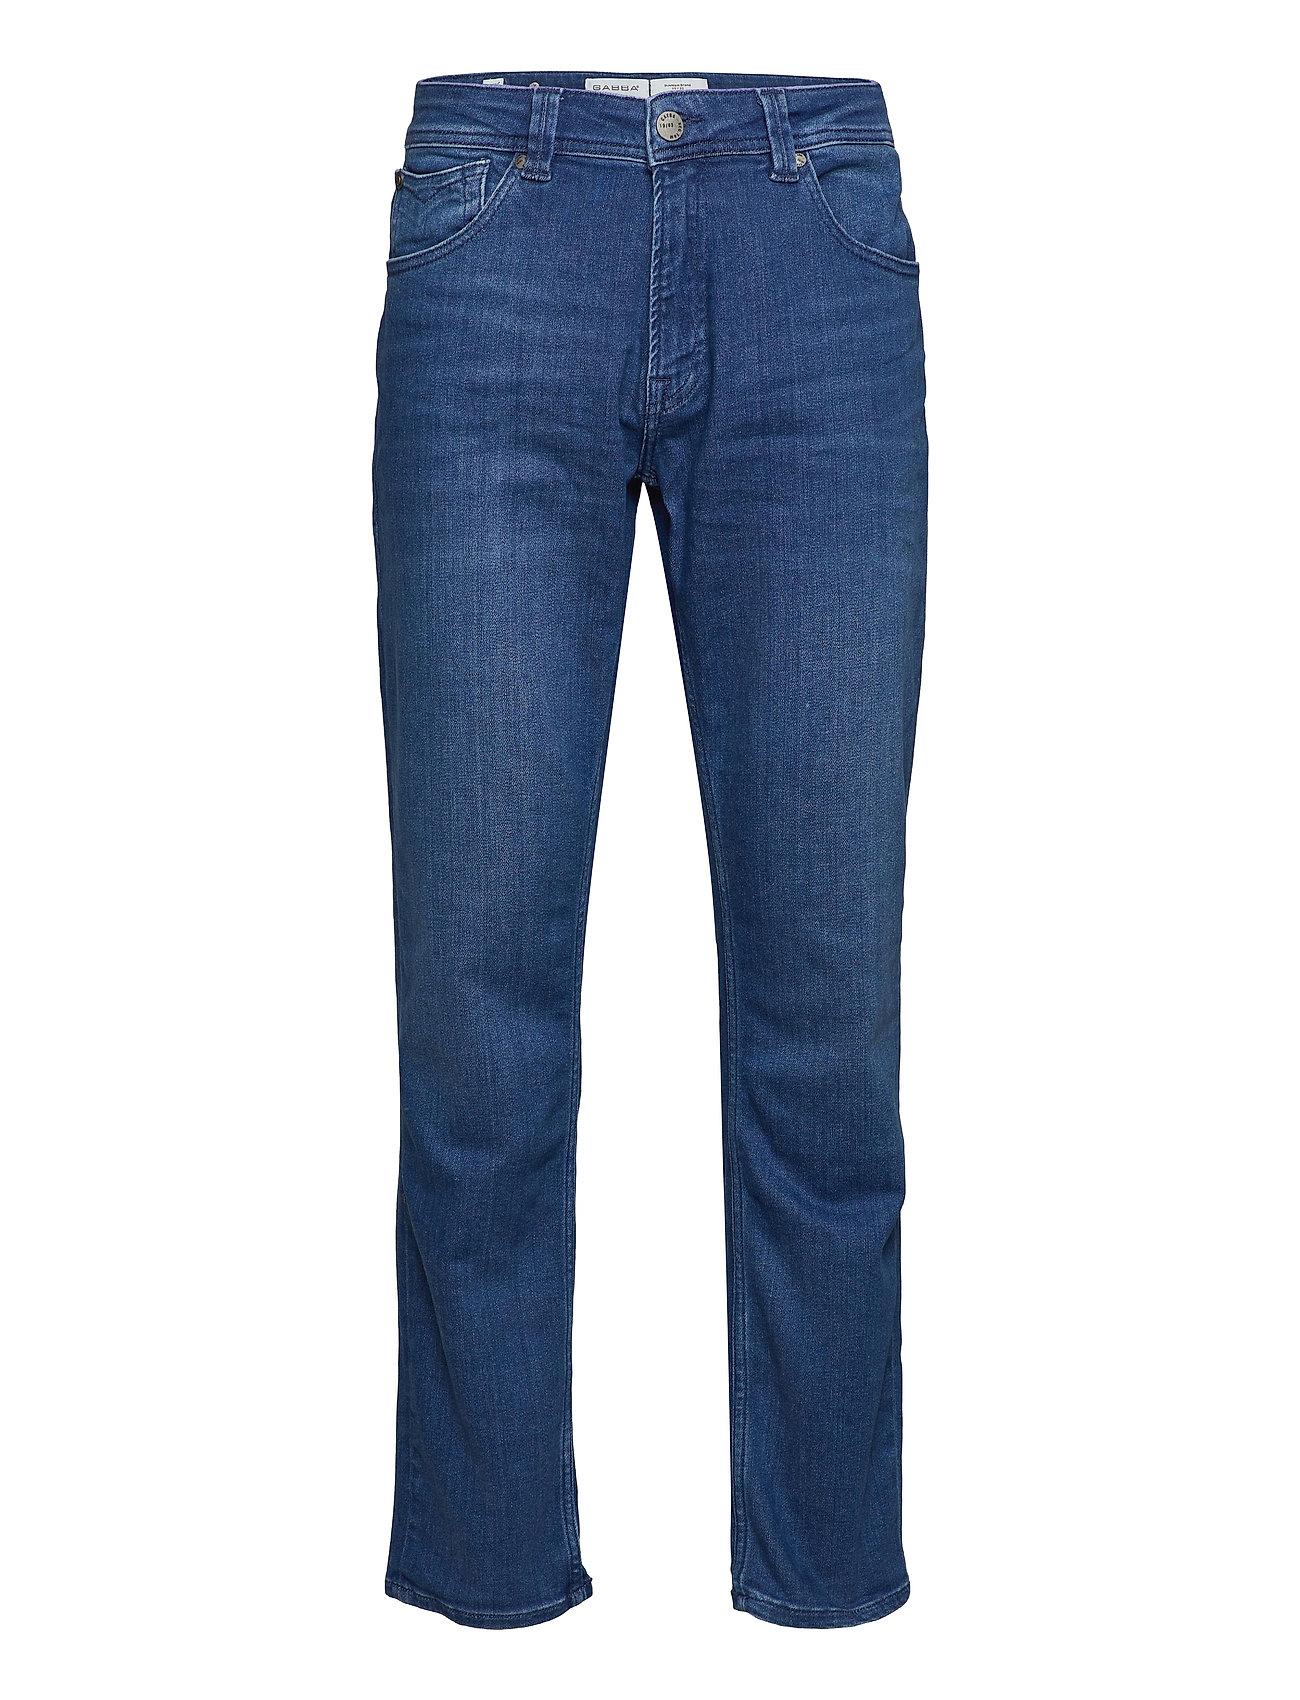 Image of Nico K3897 Jeans Jeans Blå Gabba (3493873971)